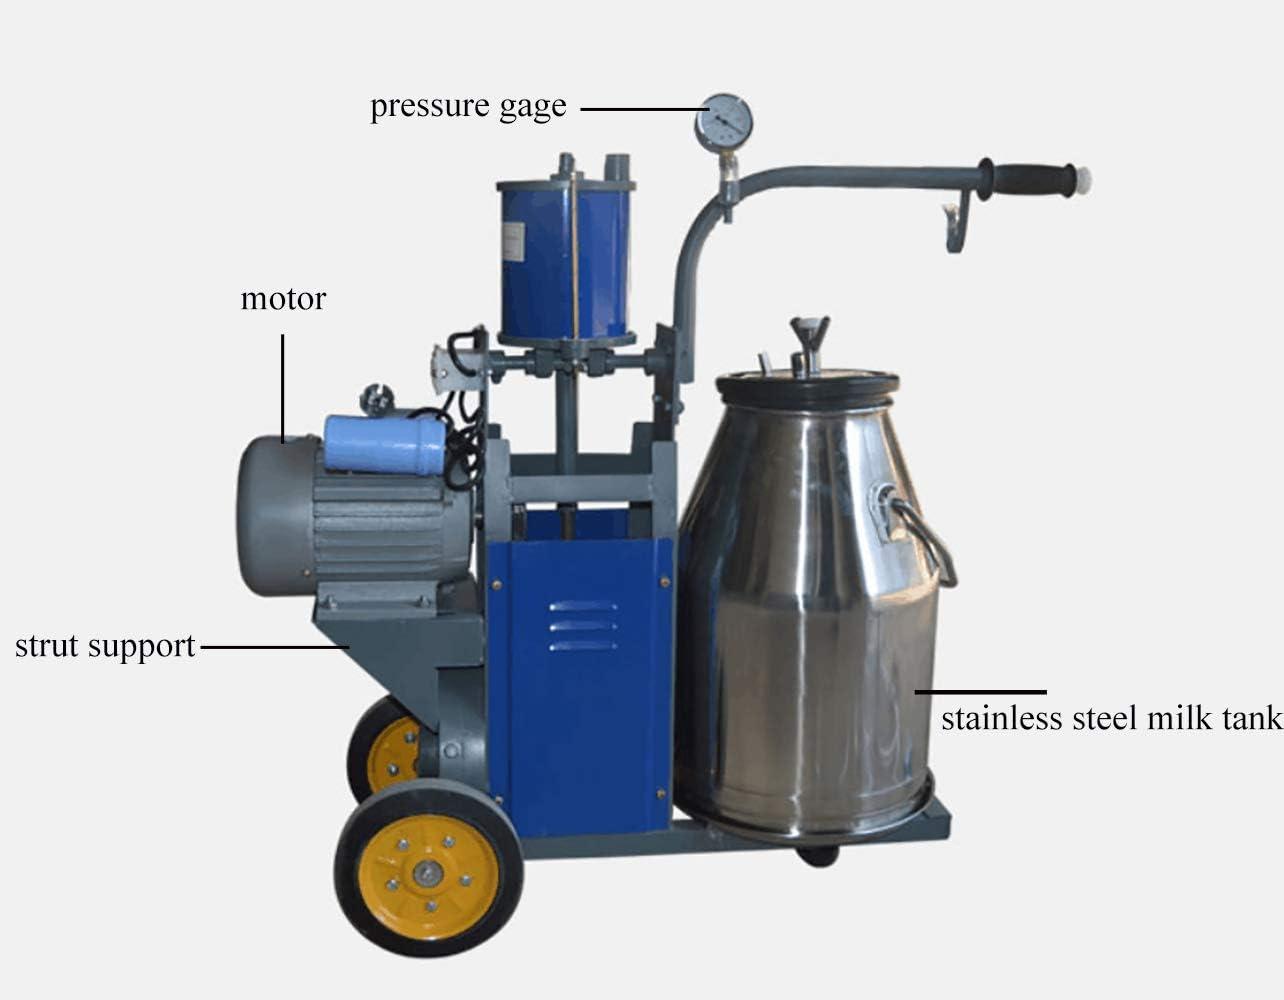 for Goat, 110V JIAWANSHUN Milker Machine Electric Milking Machine 25L Single Bucket Single Handle for Farm /& Household Cow and Goat Milking Machine 110v//220v